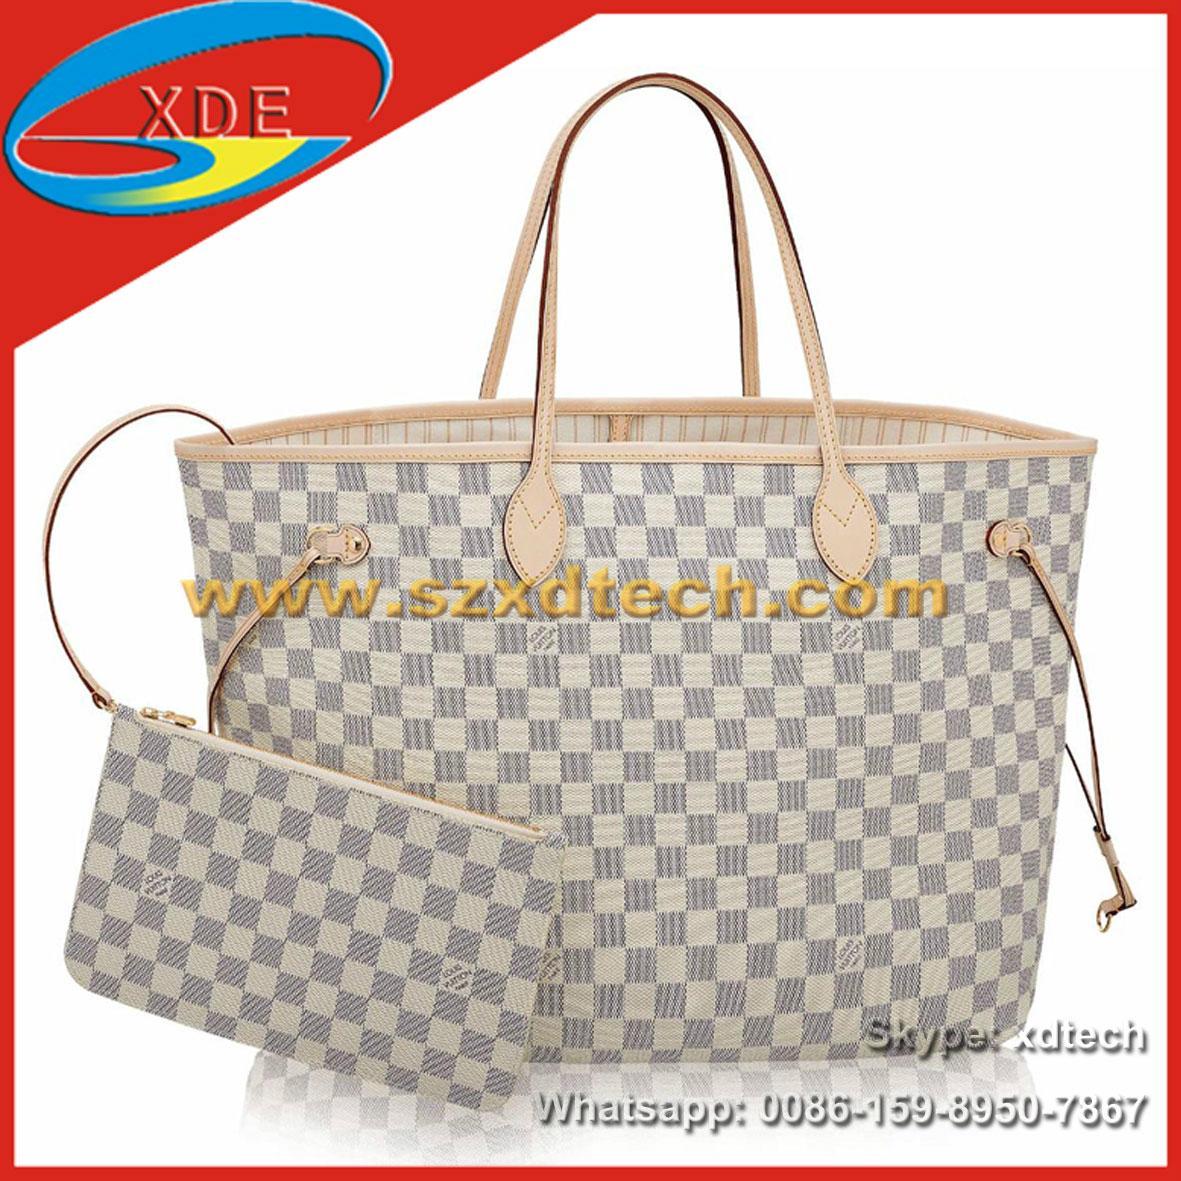 af066a172f6 Wholesale Louis Vuitton Bag LV Handbags LV AAA Handbags Replica bags 1 ...